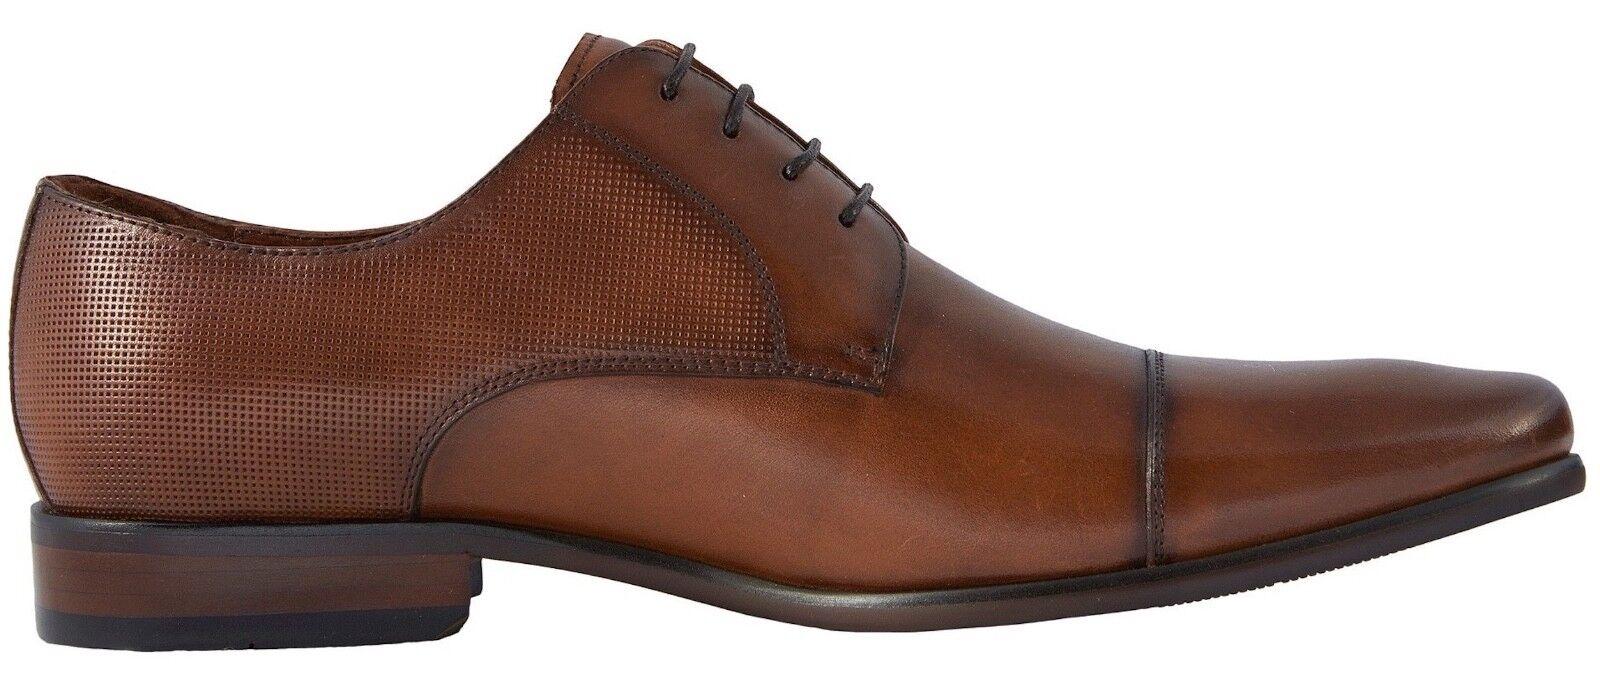 Para Hombre Florsheim Postino Cuero Puntera Cognac Cuero Postino Oxford Zapatos [15149 221] 3e55b2